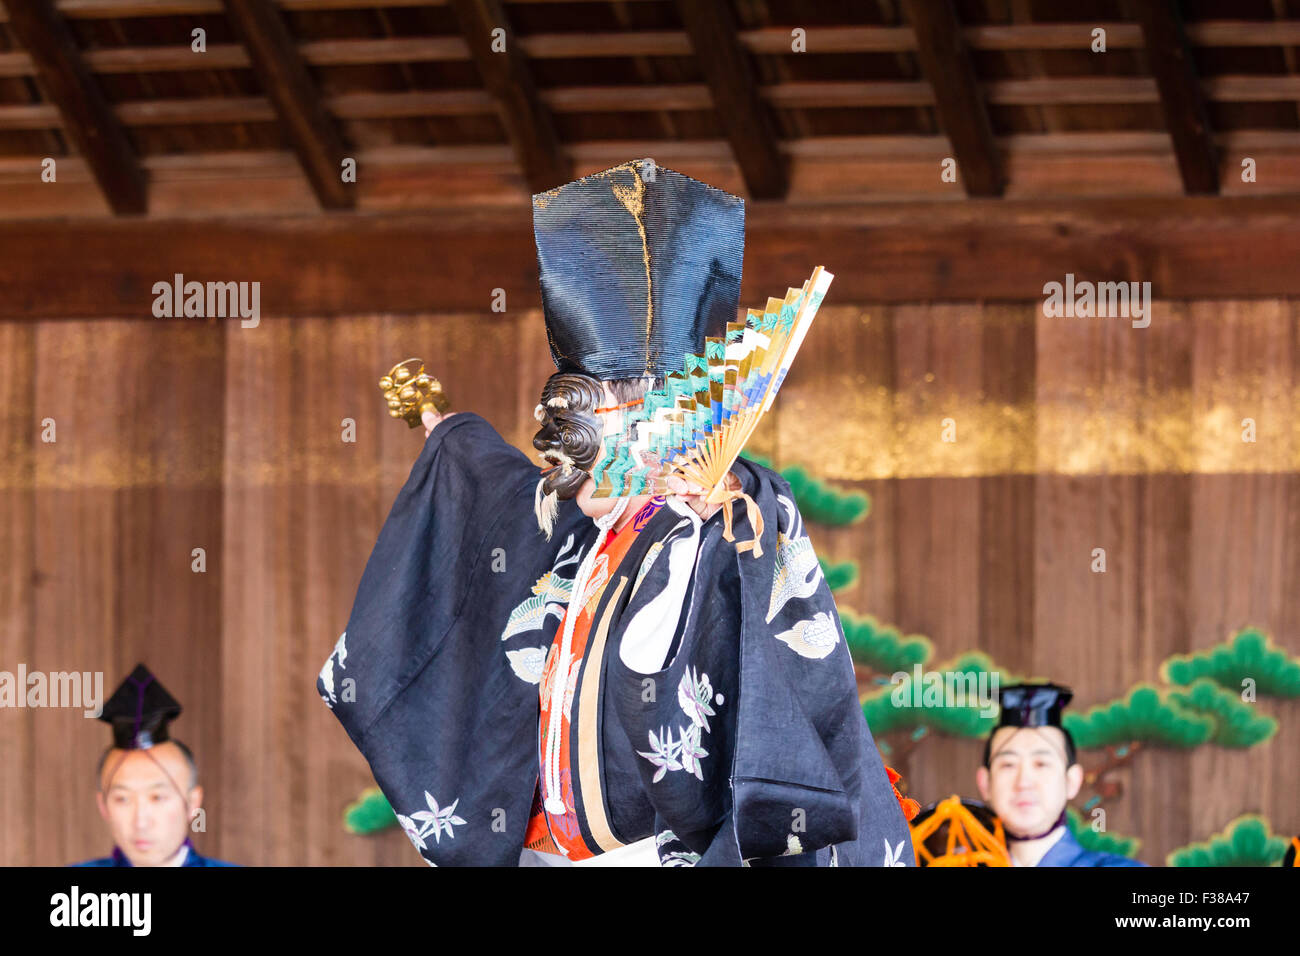 Kyoto, Yasaka Shinto shrine, traditional Noh performance, Main actor, Shite, dancing with mask, no-men or omote, - Stock Image